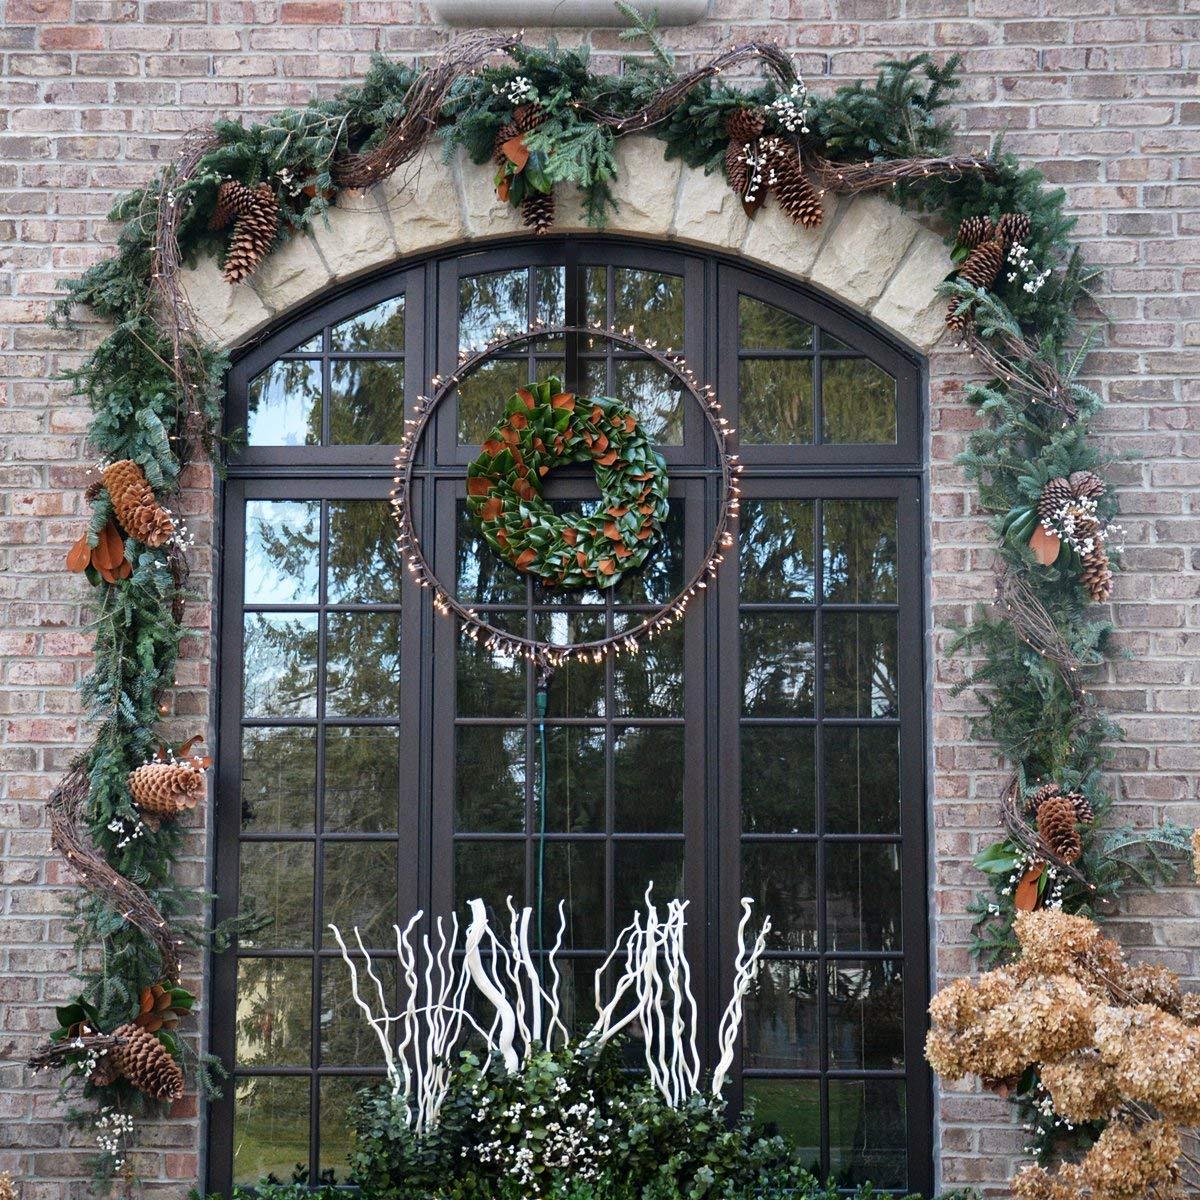 HOMEMAXS Metal Wreath Hanger Over The Door Wreath Holder 4 Packs 13.8inch Larger Wreath Metal Hook for Christmas (Black) by HOMEMAXS (Image #6)